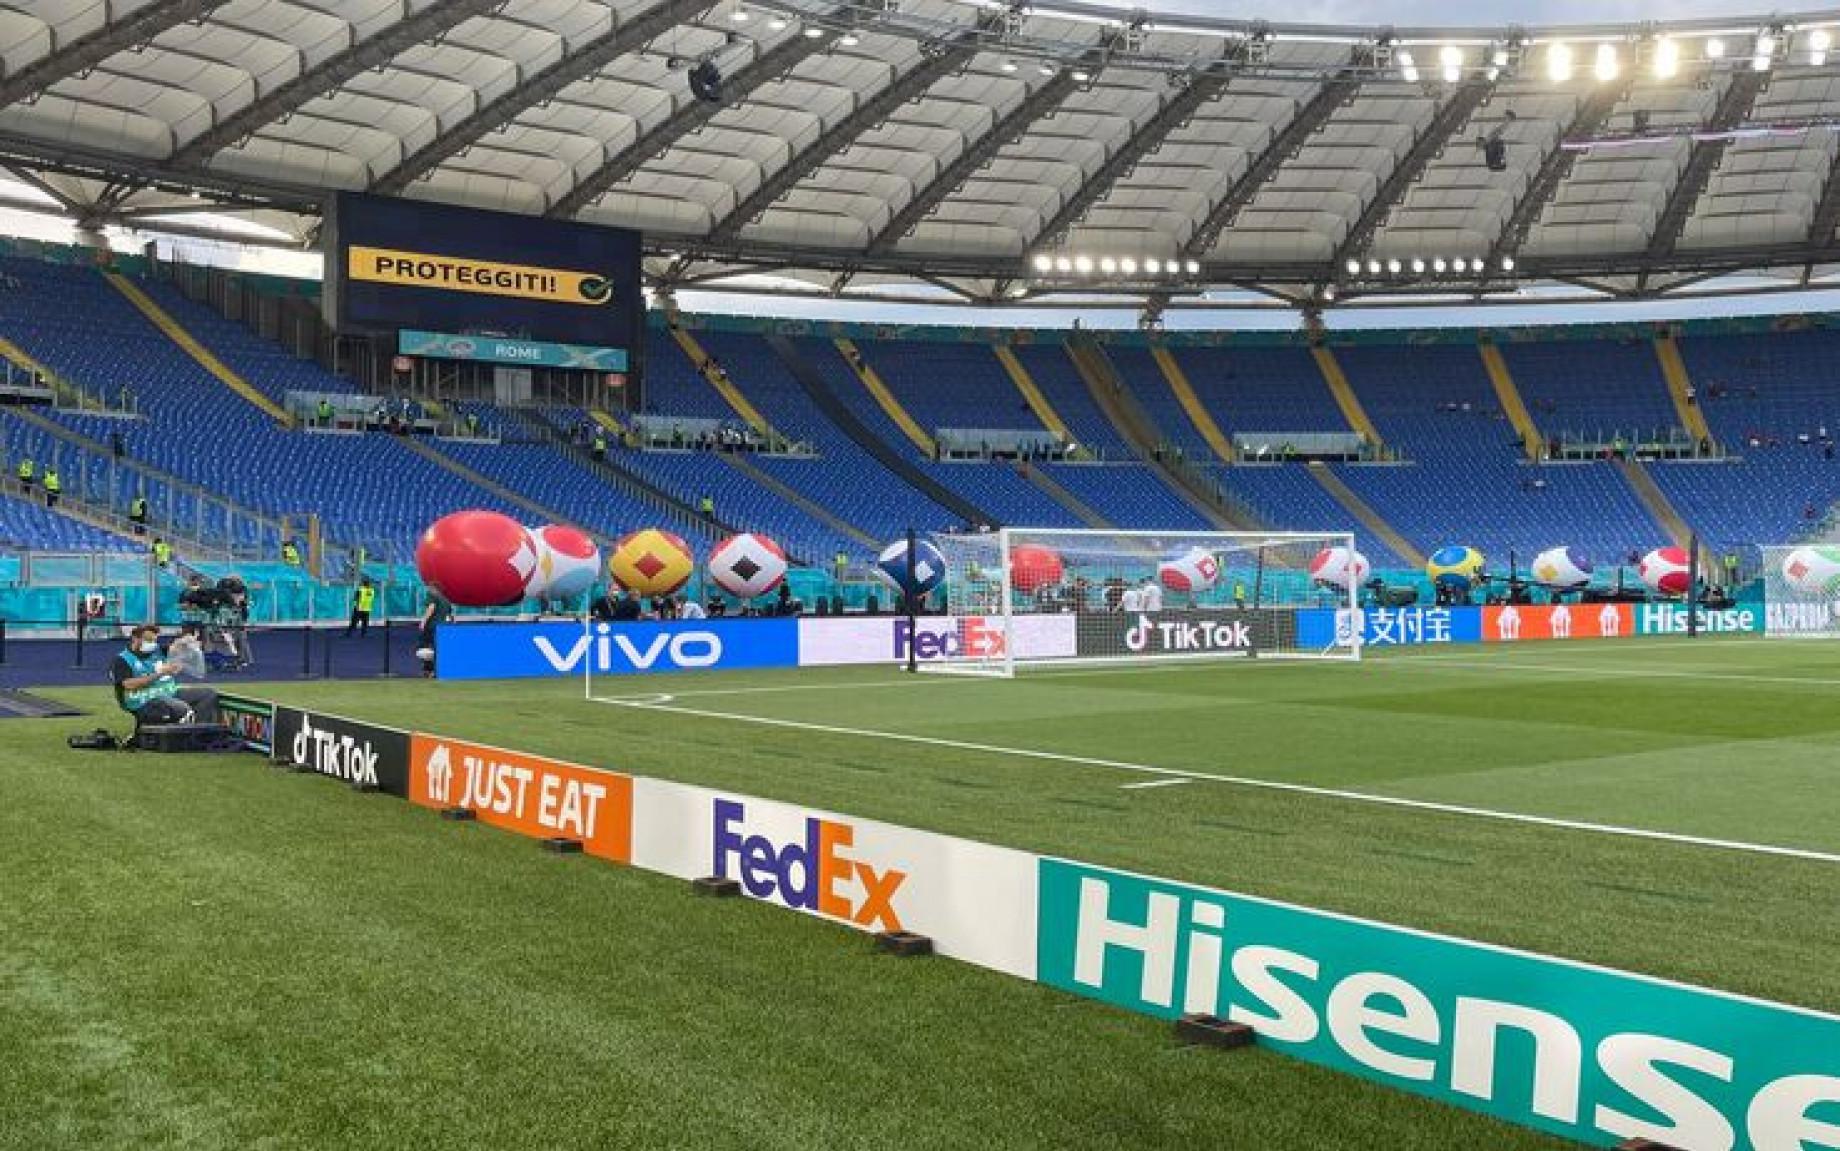 stadio-olimpico-roma-euro2020-gdm-3.jpeg